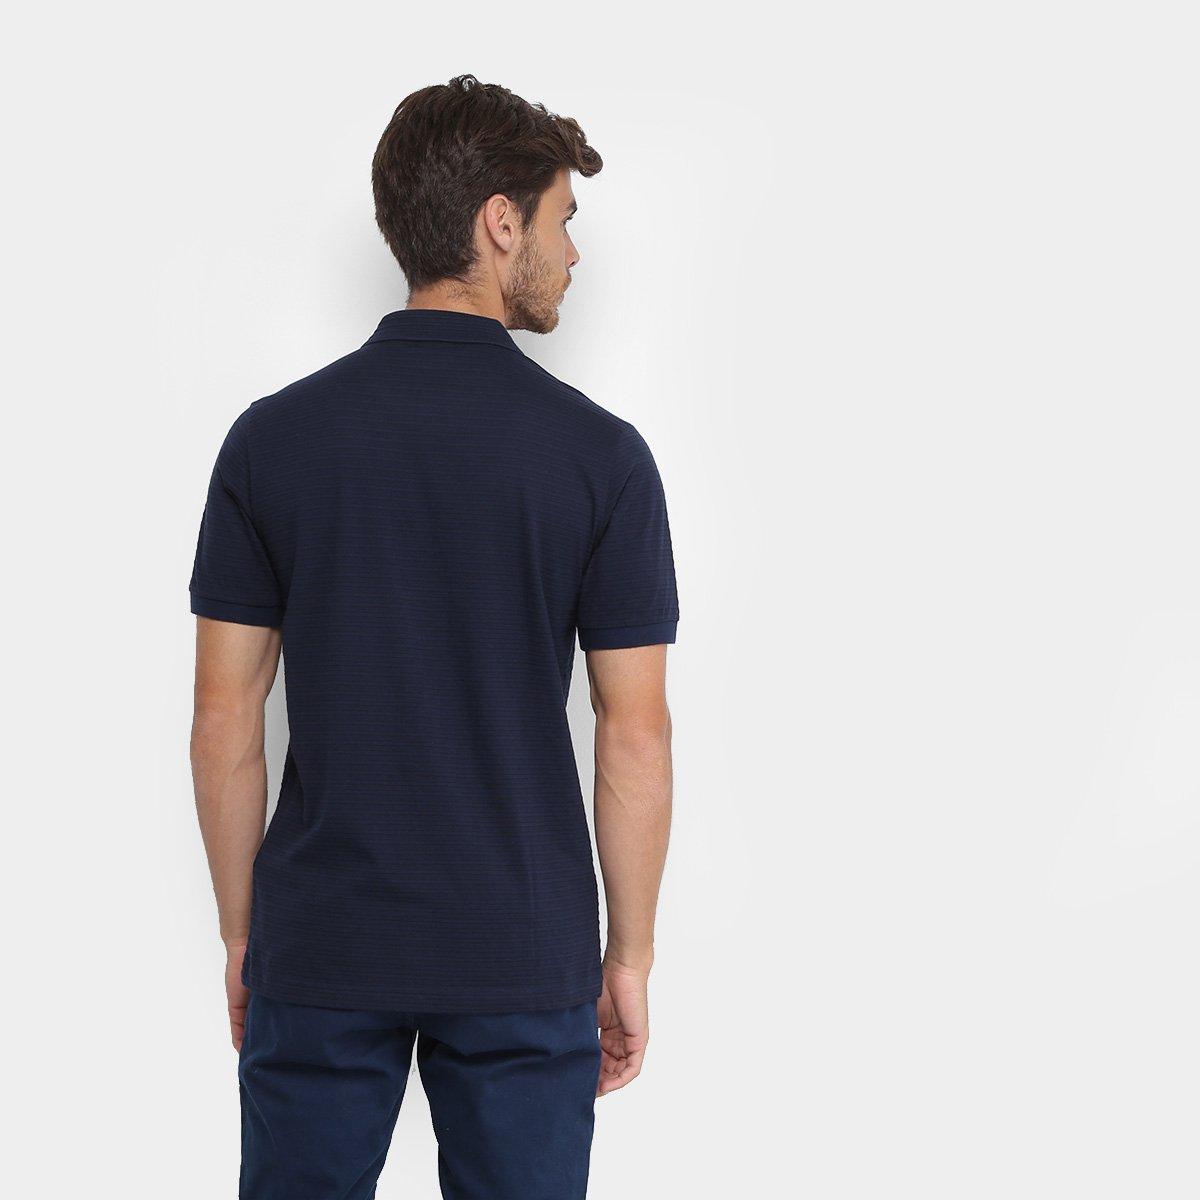 Foto 2 - Camisa Polo Lacoste Live Malha Textura Masculina